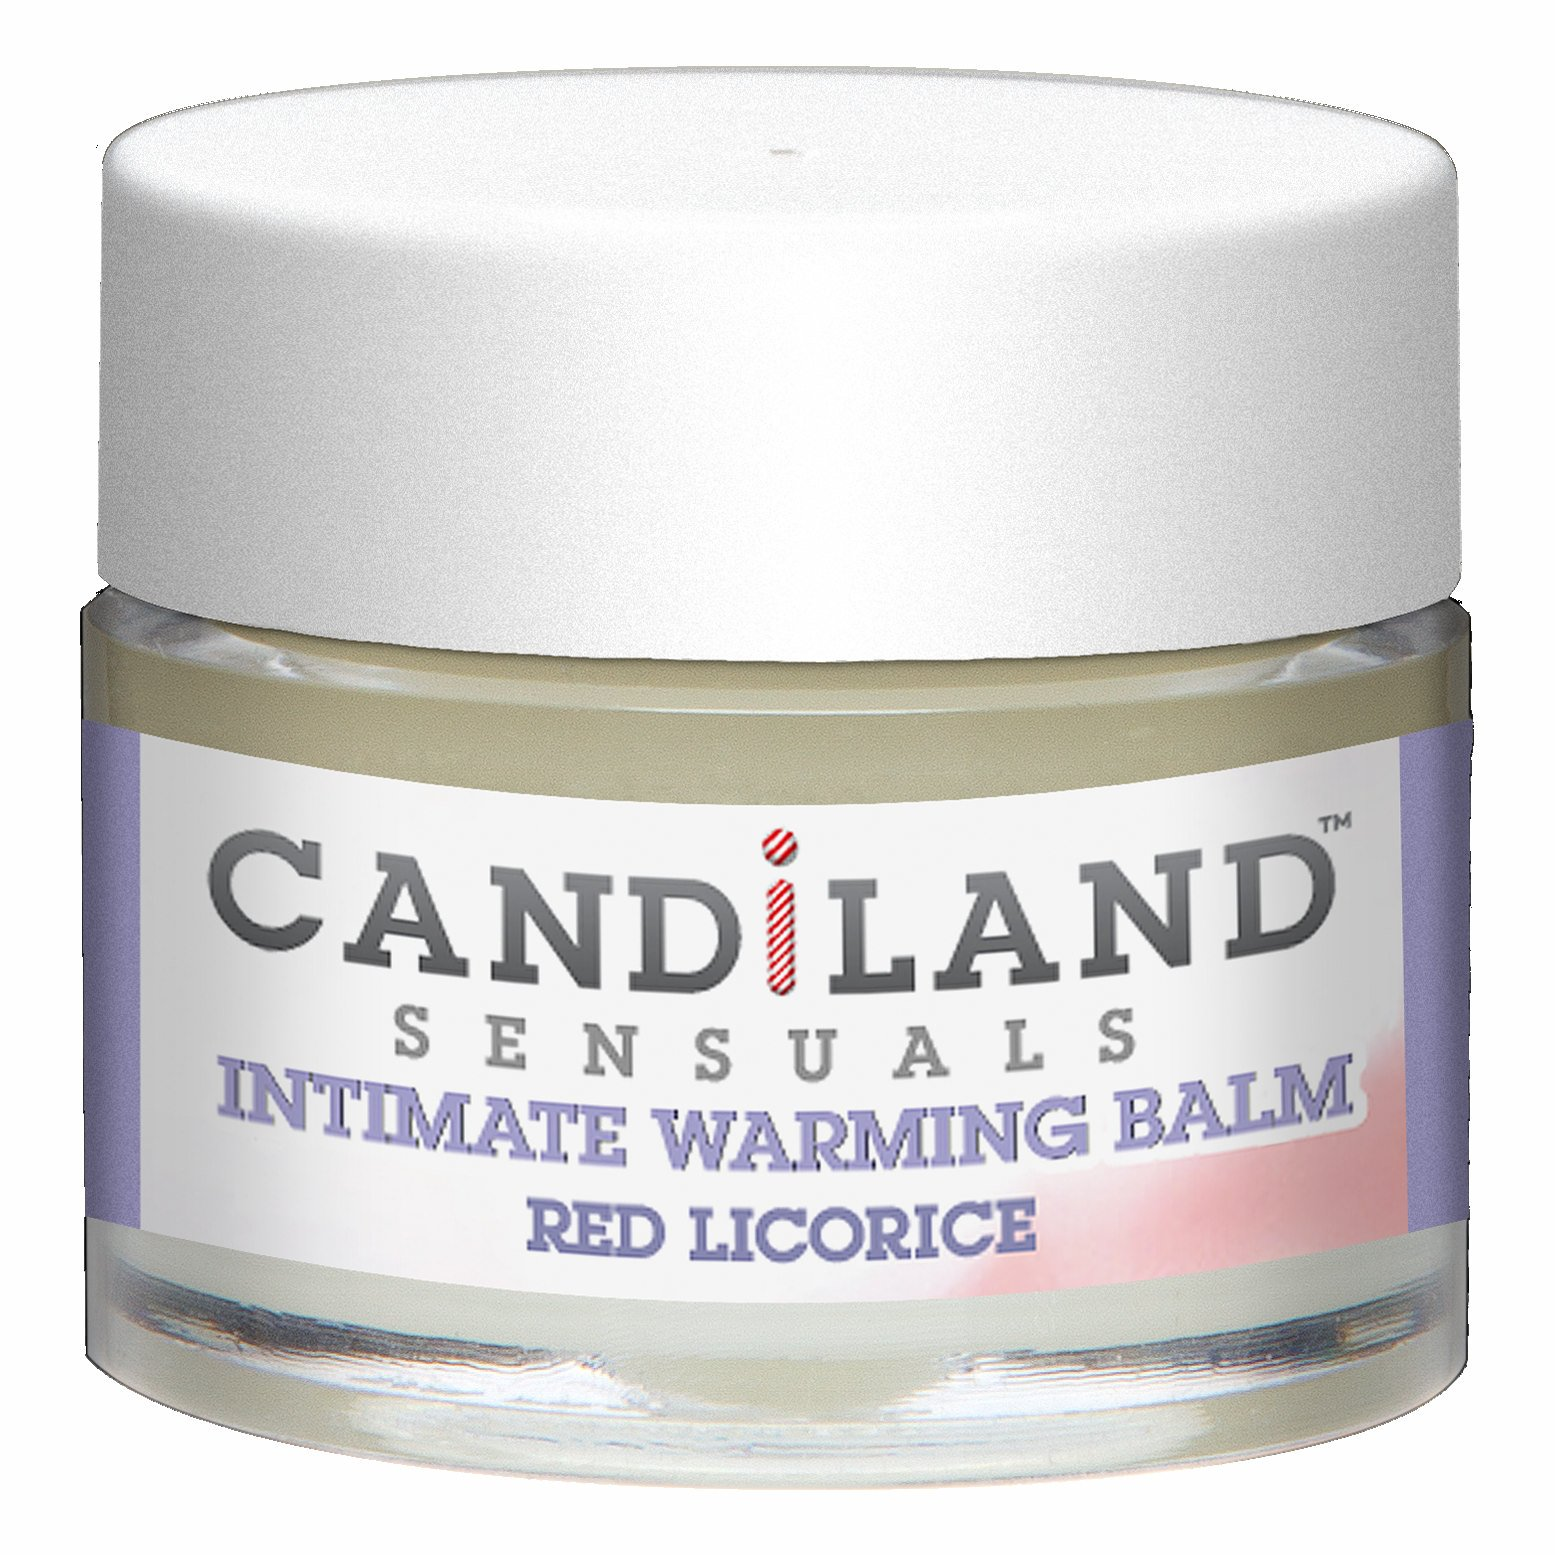 CANDILAND WARMING BALM RED LICORICE .25 OZ(CD)